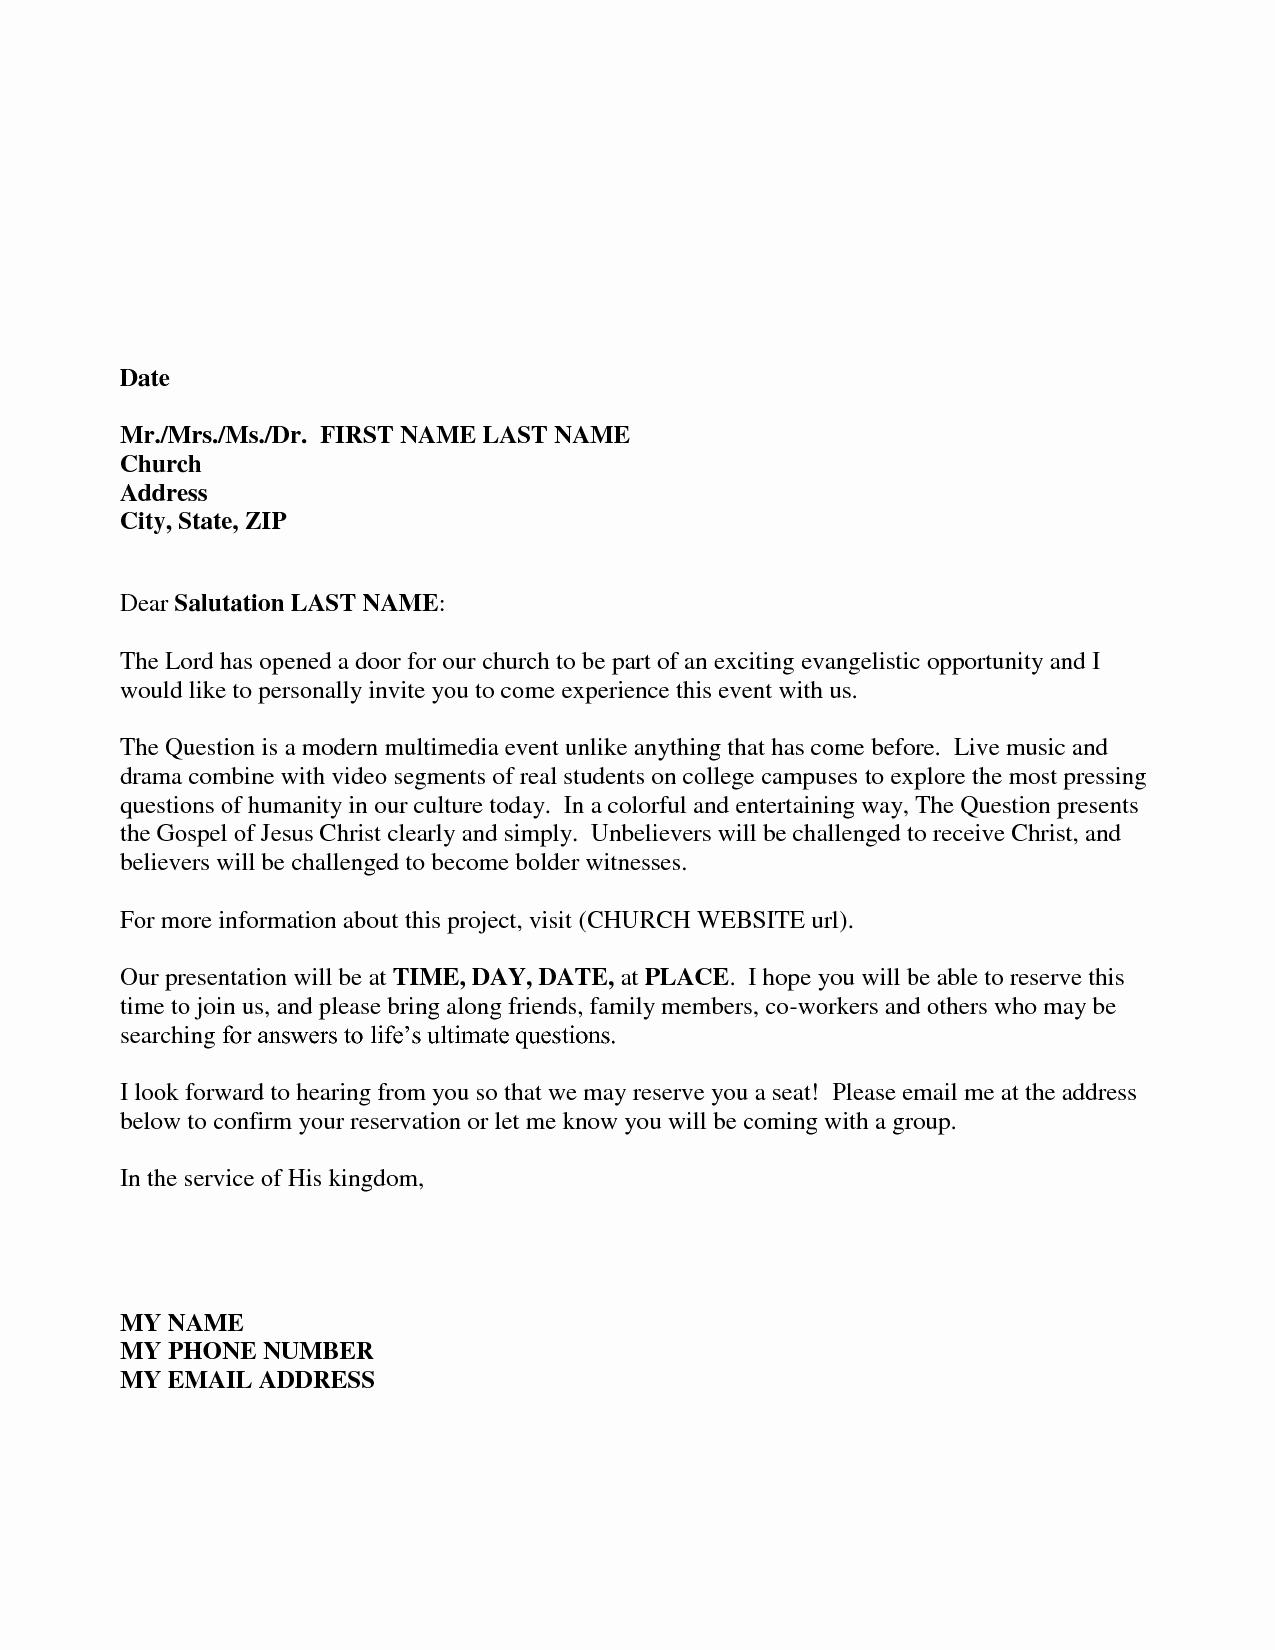 Pastor Anniversary Invitation Letter Fresh Sample Church Invitation Letter Sample Invitation Letters